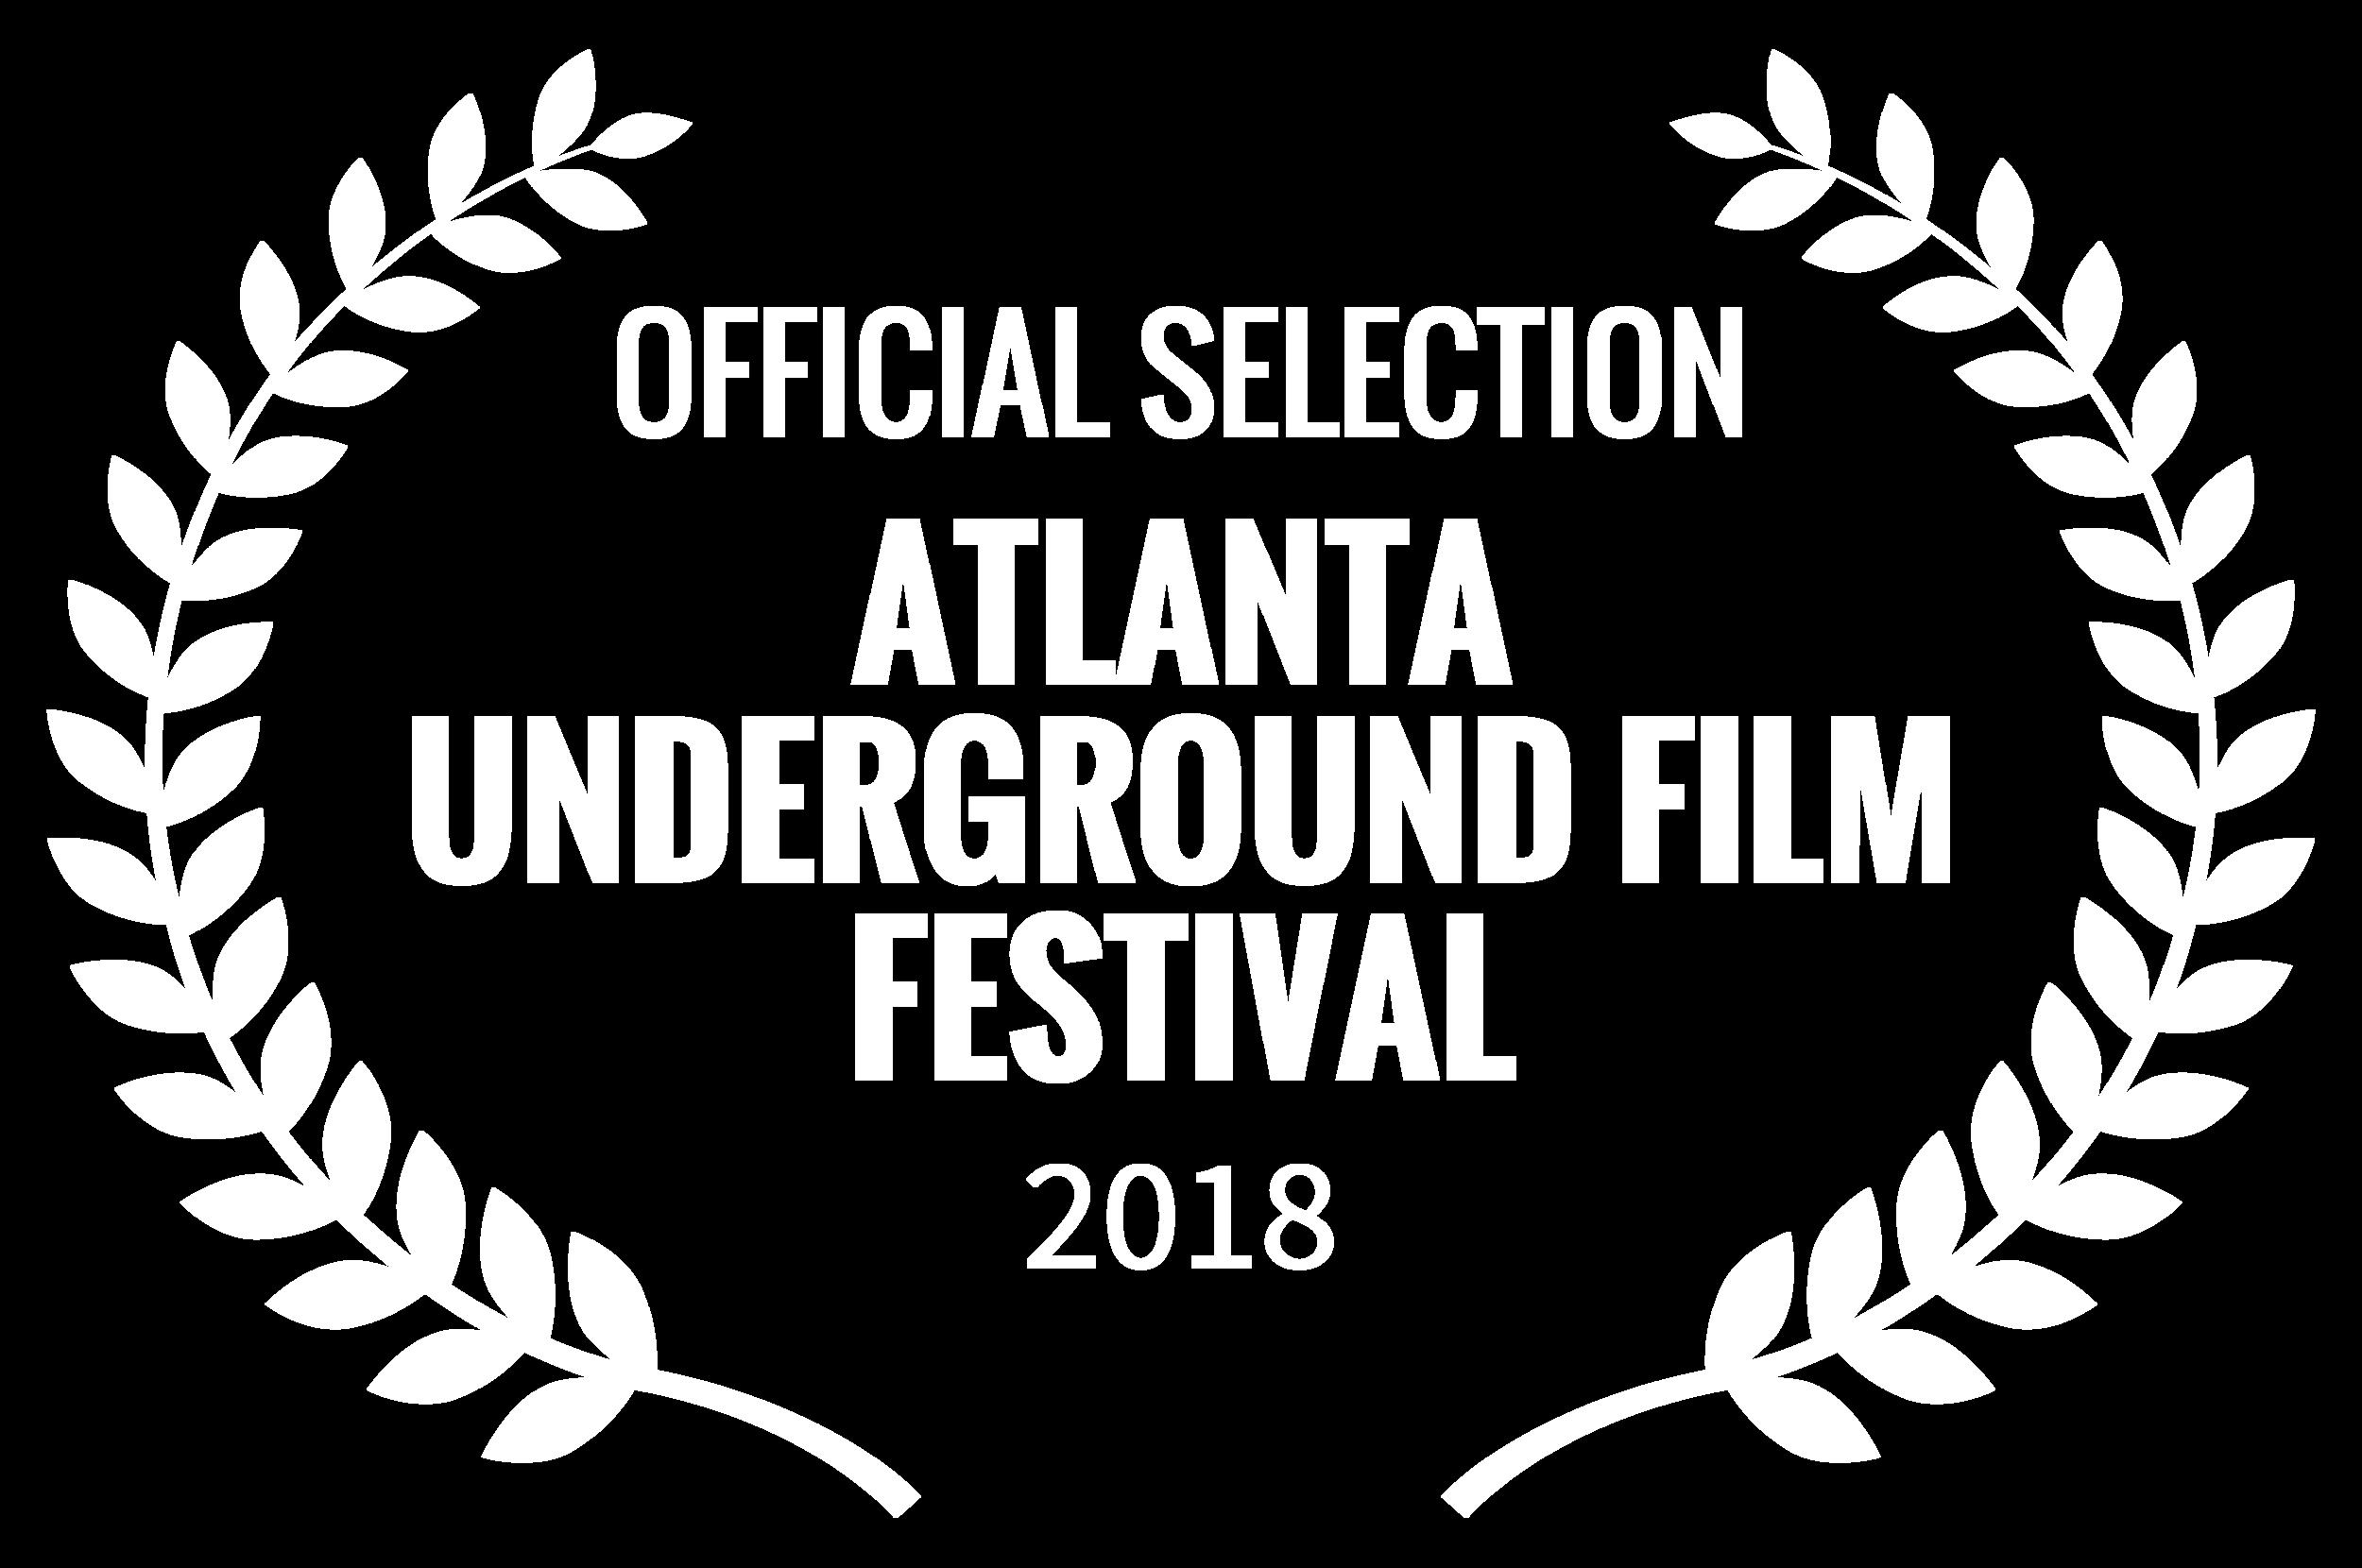 OFFICIALSELECTION-ATLANTAUNDERGROUNDFILMFESTIVAL-2018.png